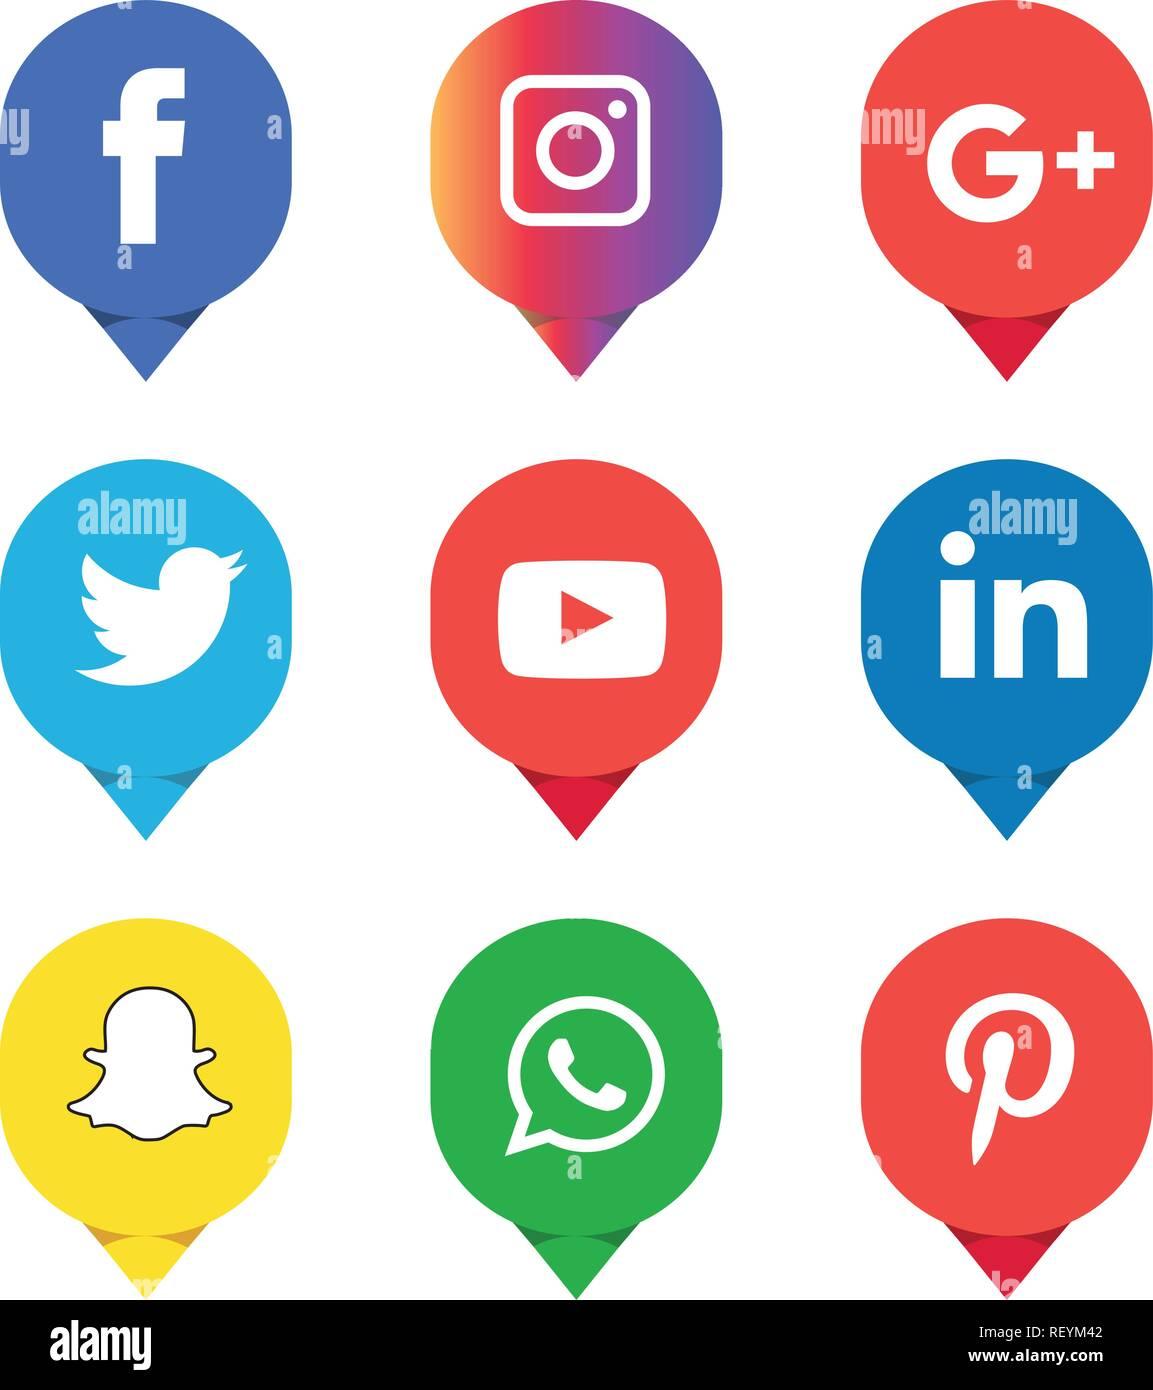 Facebook Twitter Instagram Icons : facebook, twitter, instagram, icons, Social, Media, Icons, Vector, Illustrator, Facebook,, Instagram,, Twitter,, Whatsapp,, Google, Plus,, Google+,, Pinterest,, Linkedin,, Vector,, Black,, White, Stock, Image, Alamy